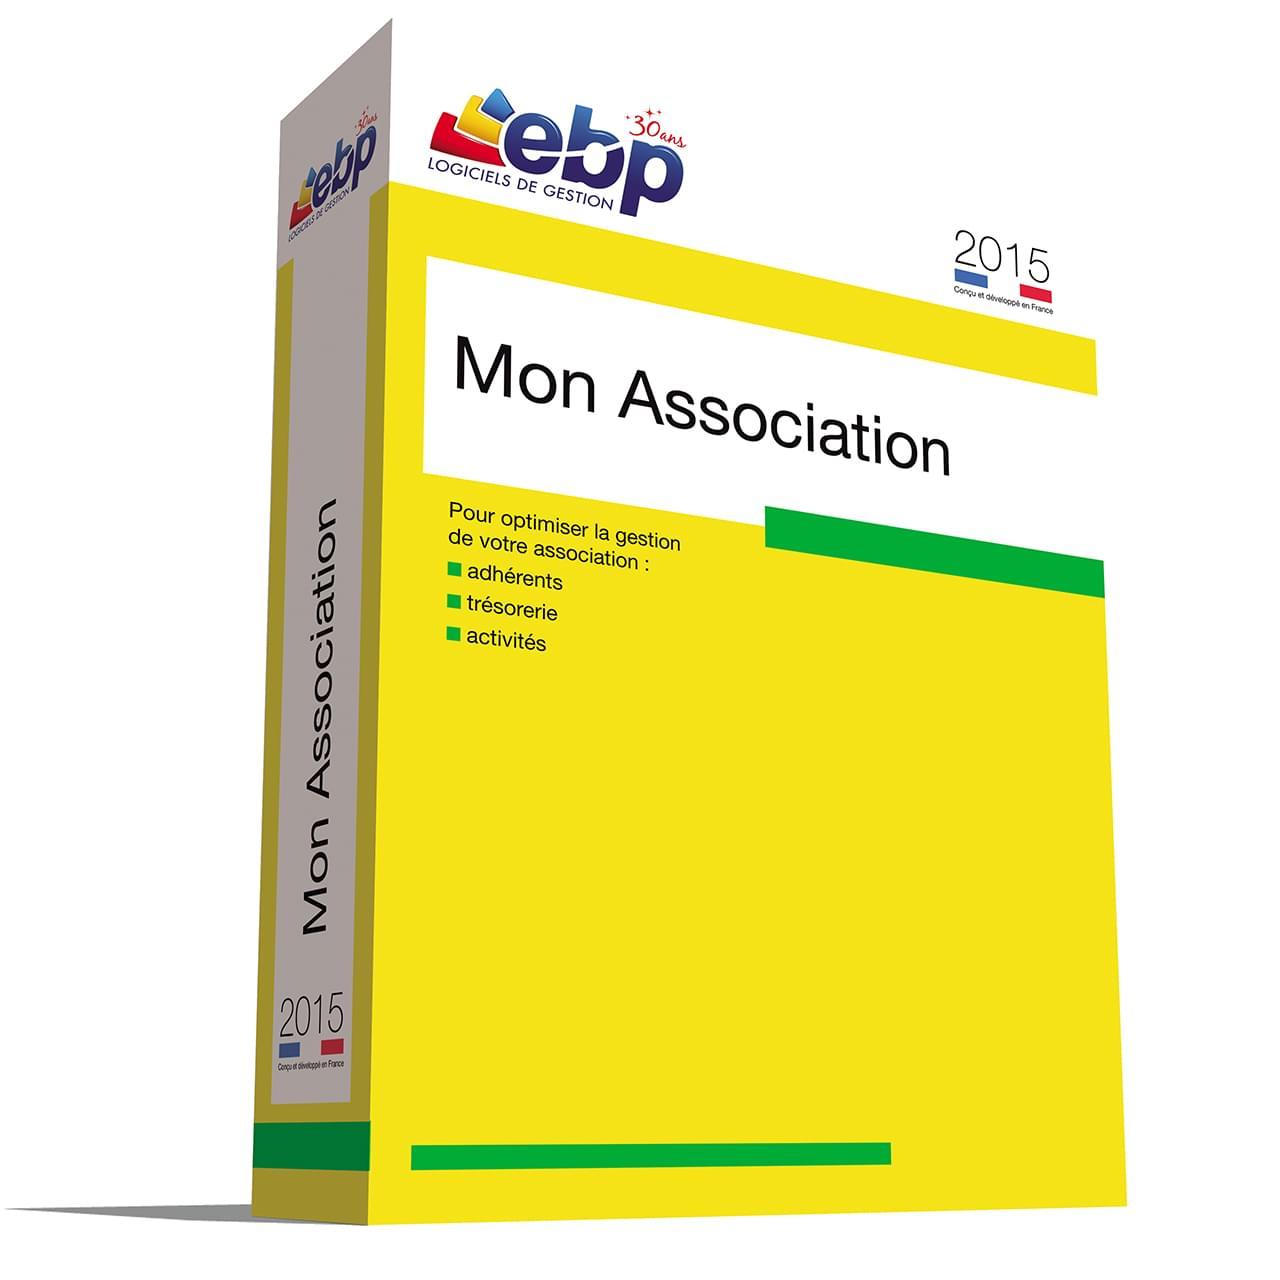 EBP Mon Association 2015 - Logiciel application - Cybertek.fr - 0